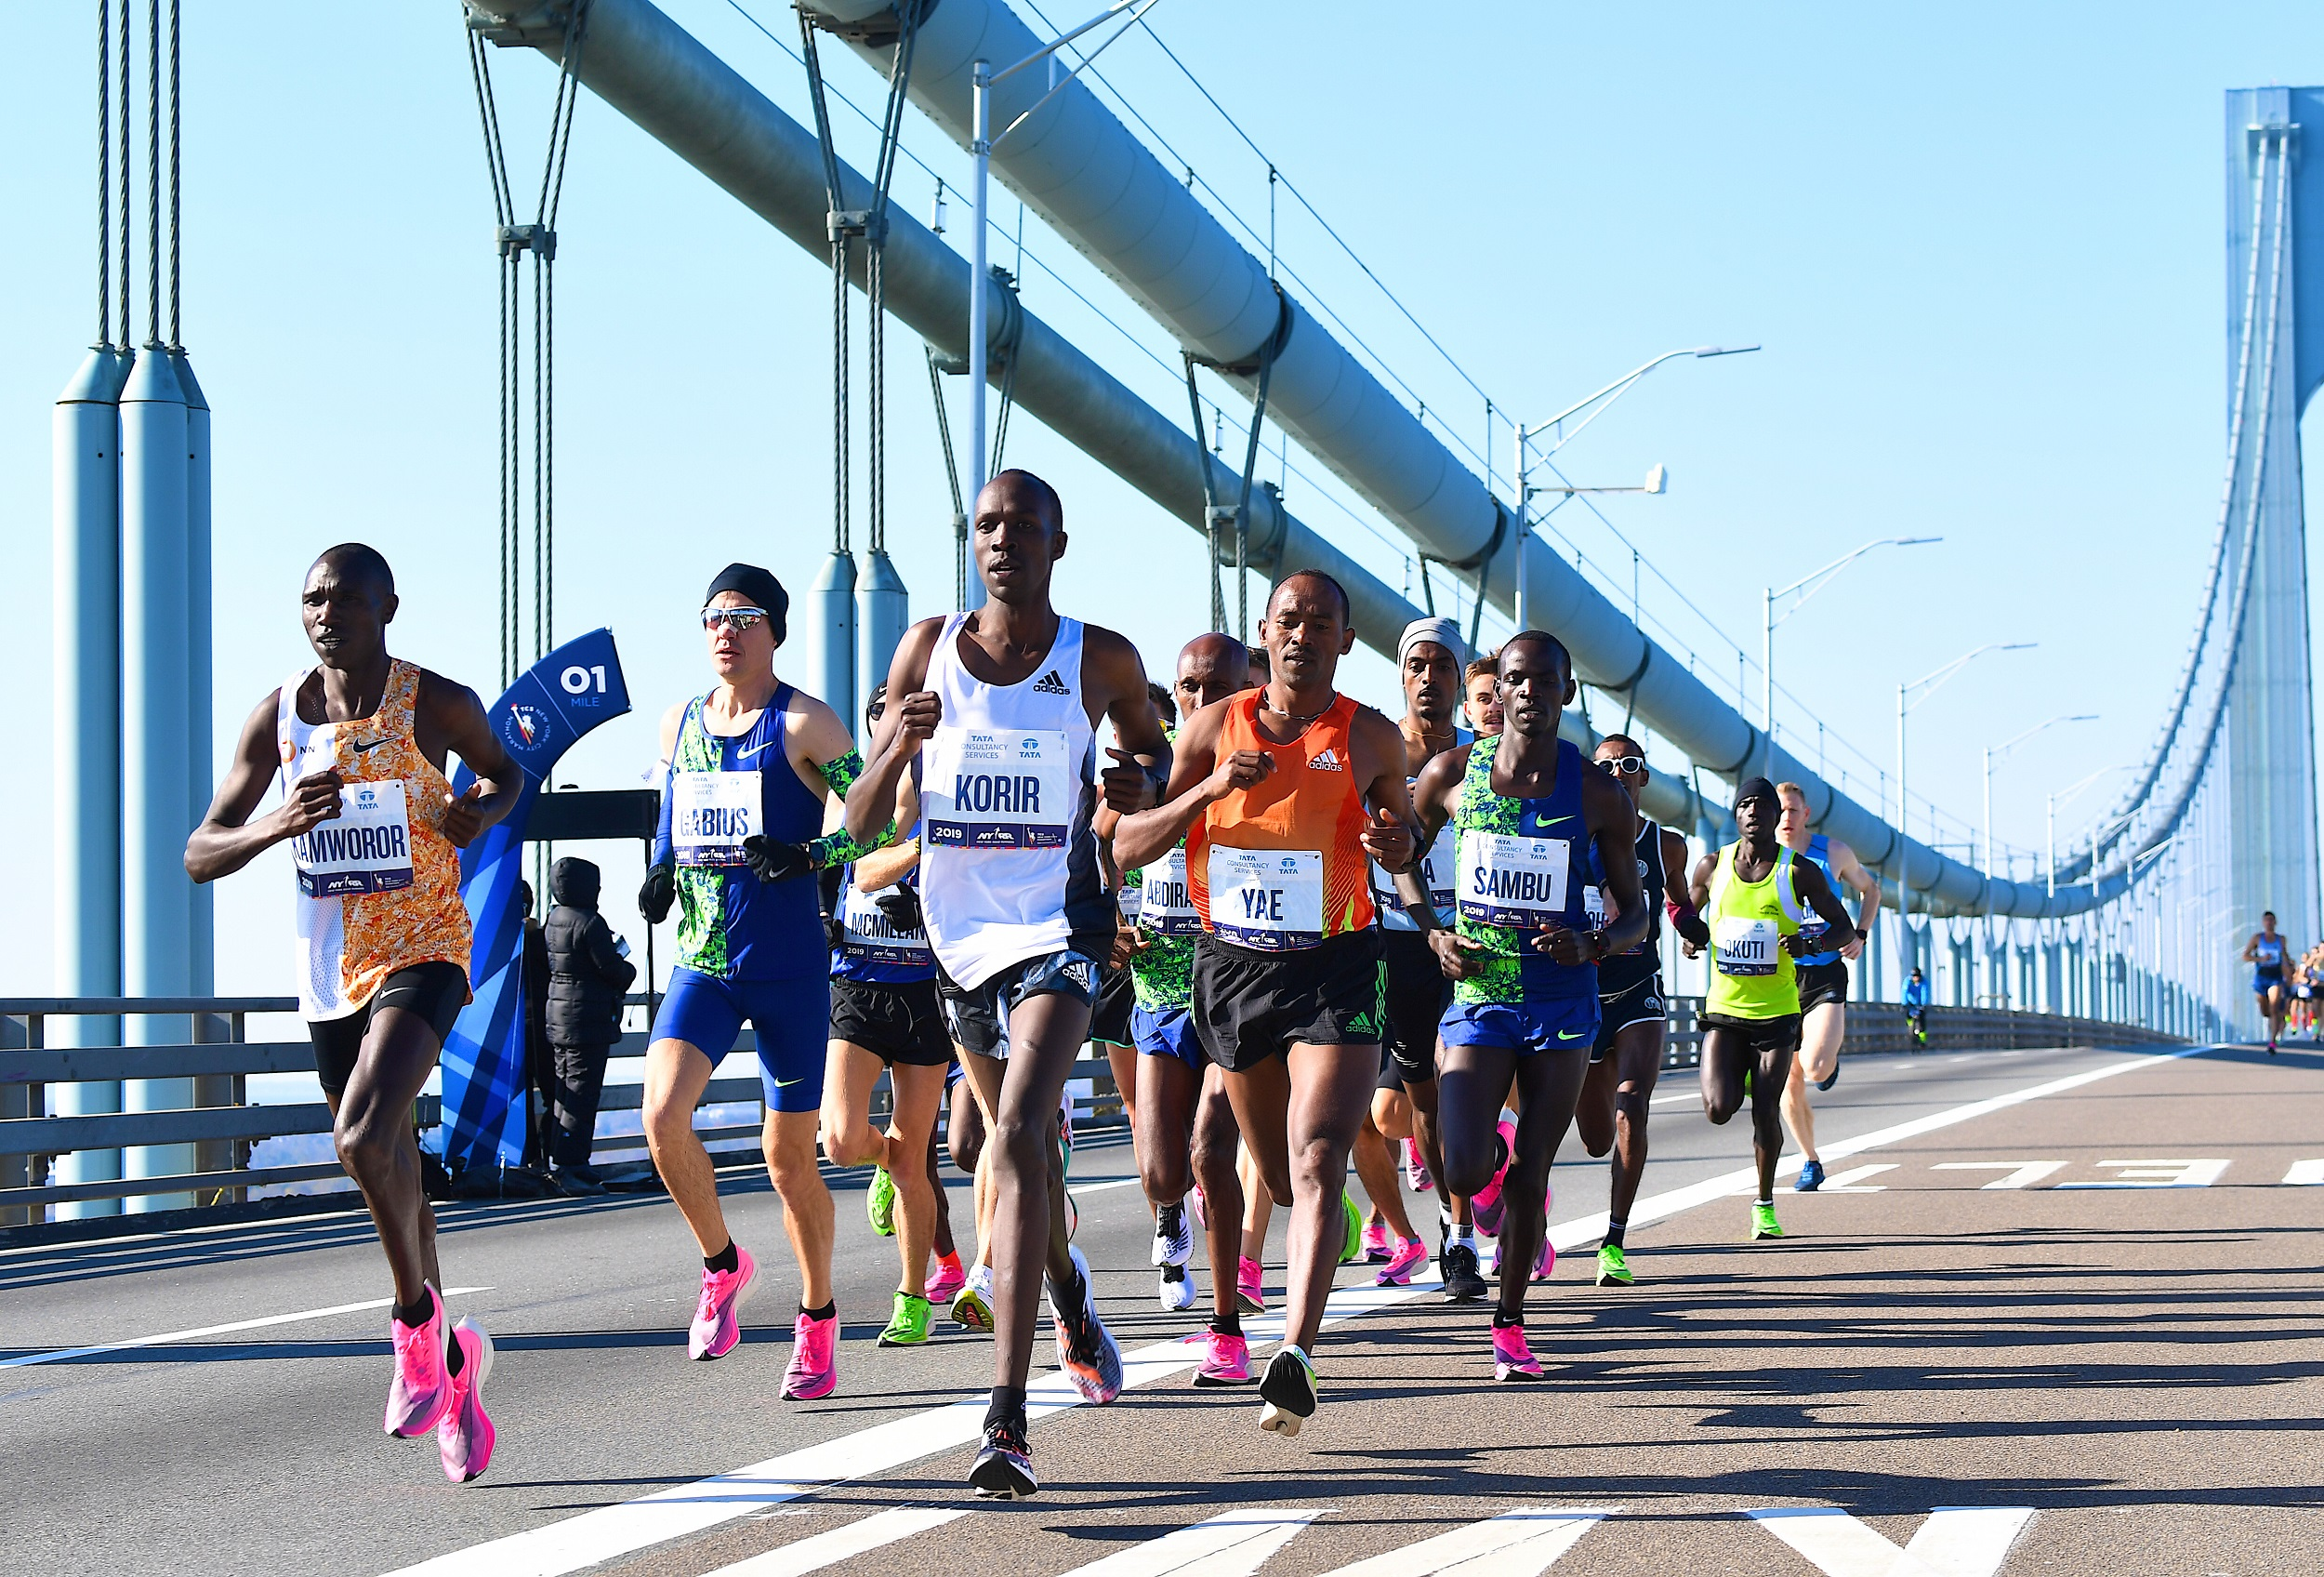 Coronavirus risk too high, New York City Marathon cancelled